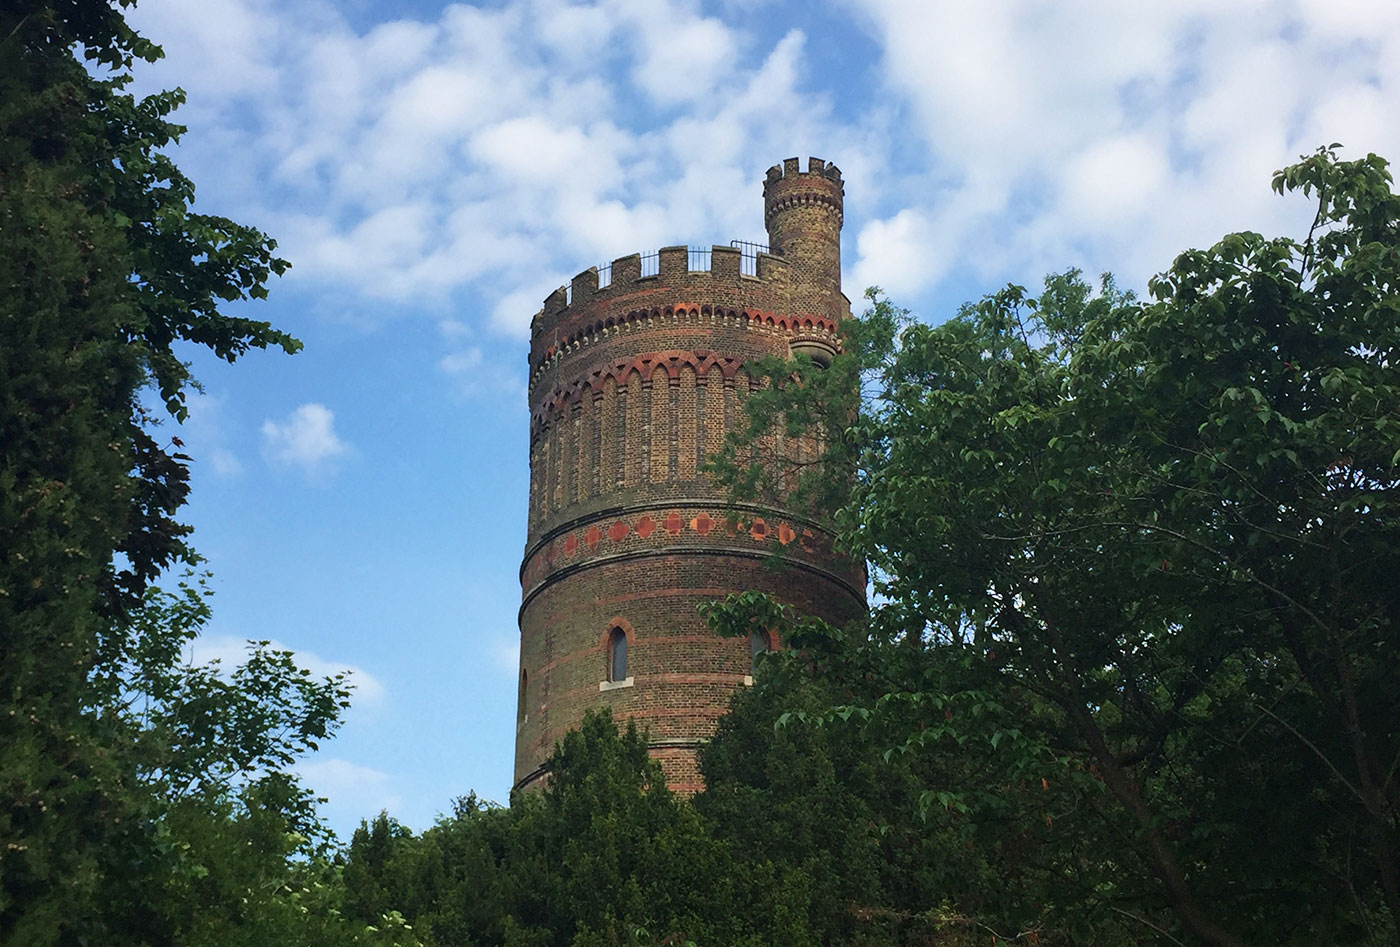 Water Tower, Park Hill, Croydon